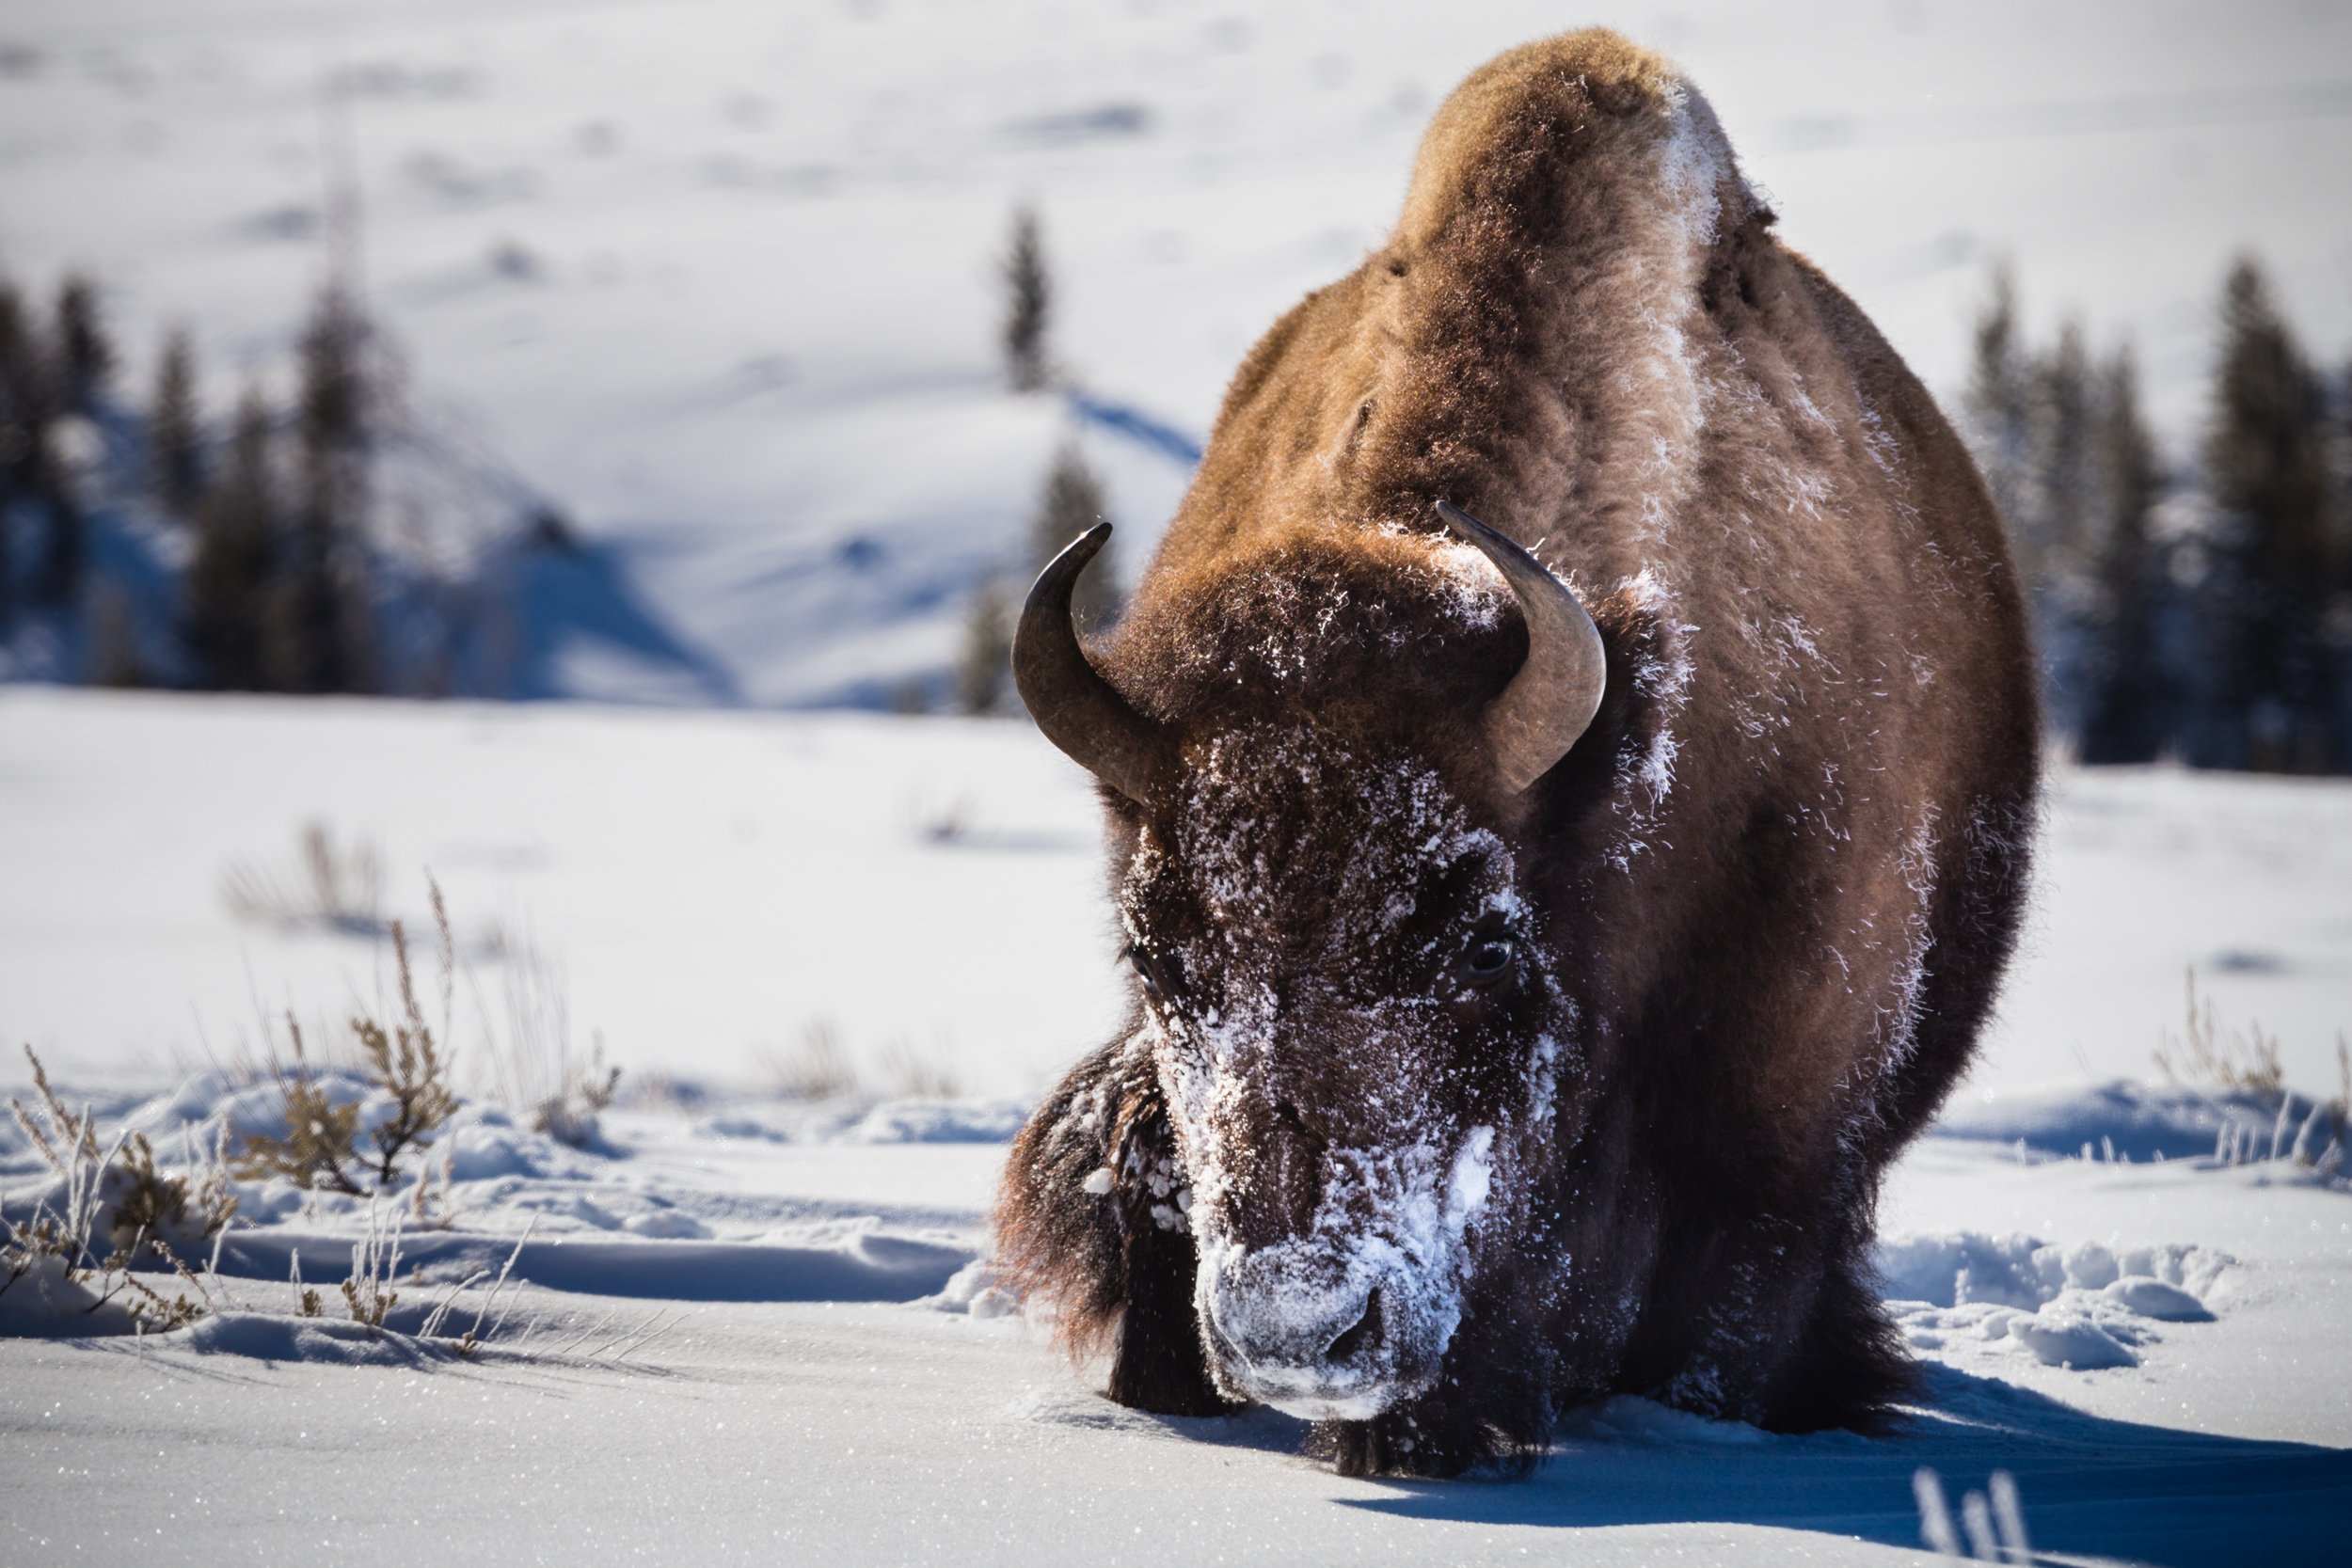 Trudge. Yellowstone N.P. (Feb. 2019)